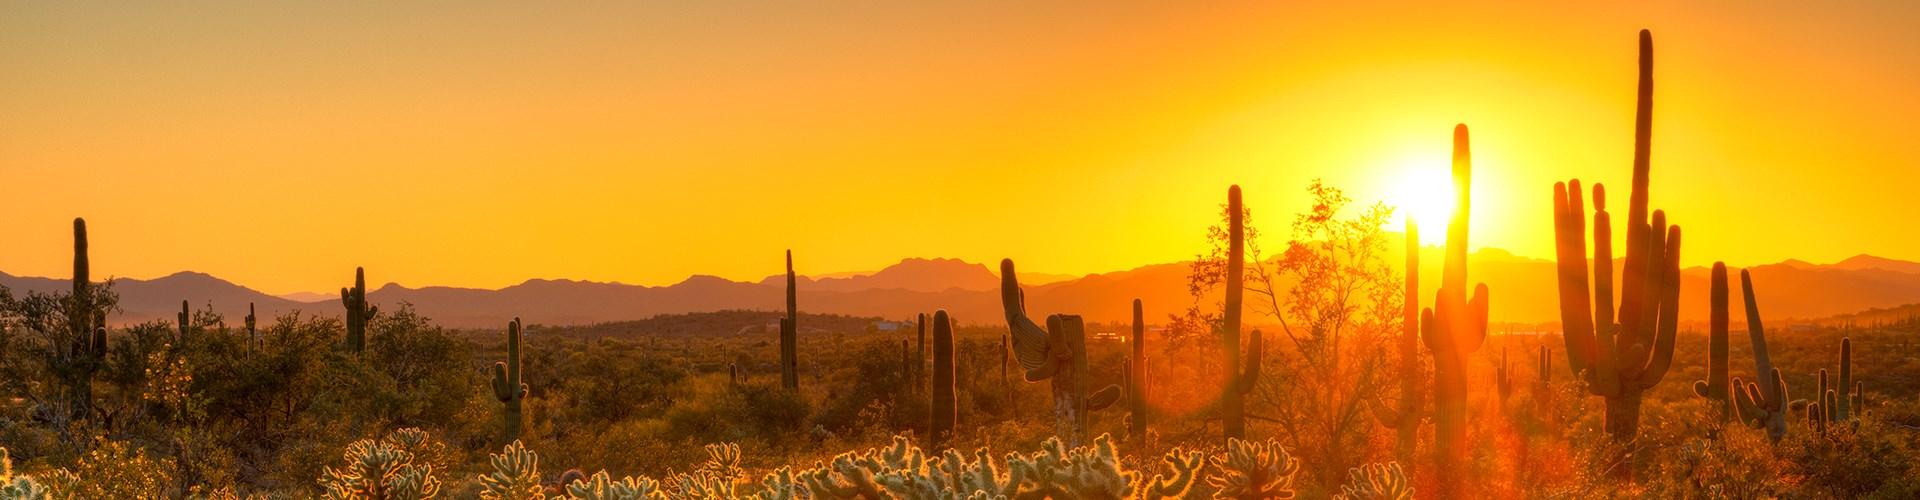 Sunset in the Arizona desert with saguaro cacti